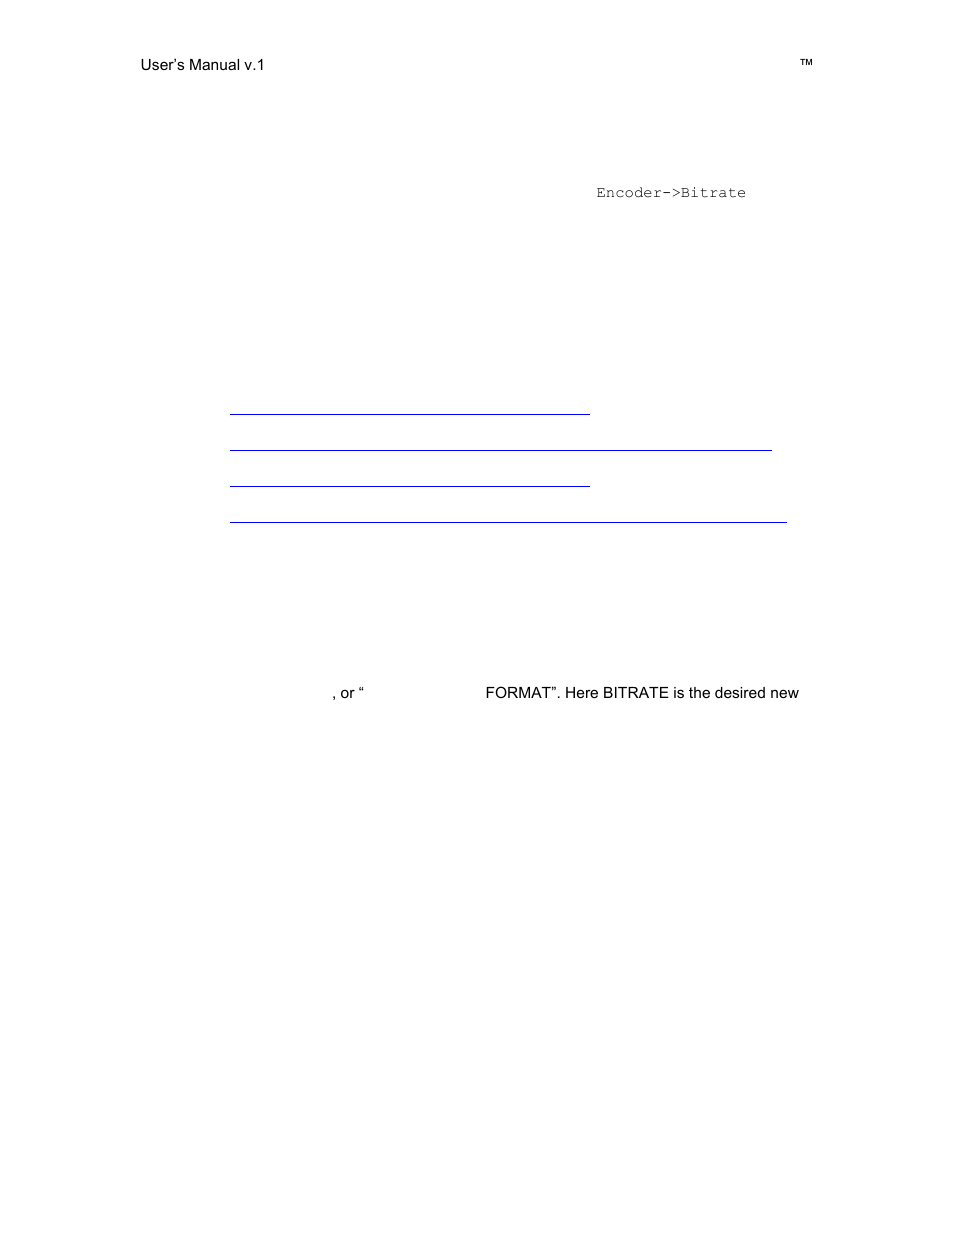 QVidium QVENC Encoder v17 User Manual   Page 31 / 73   Also for